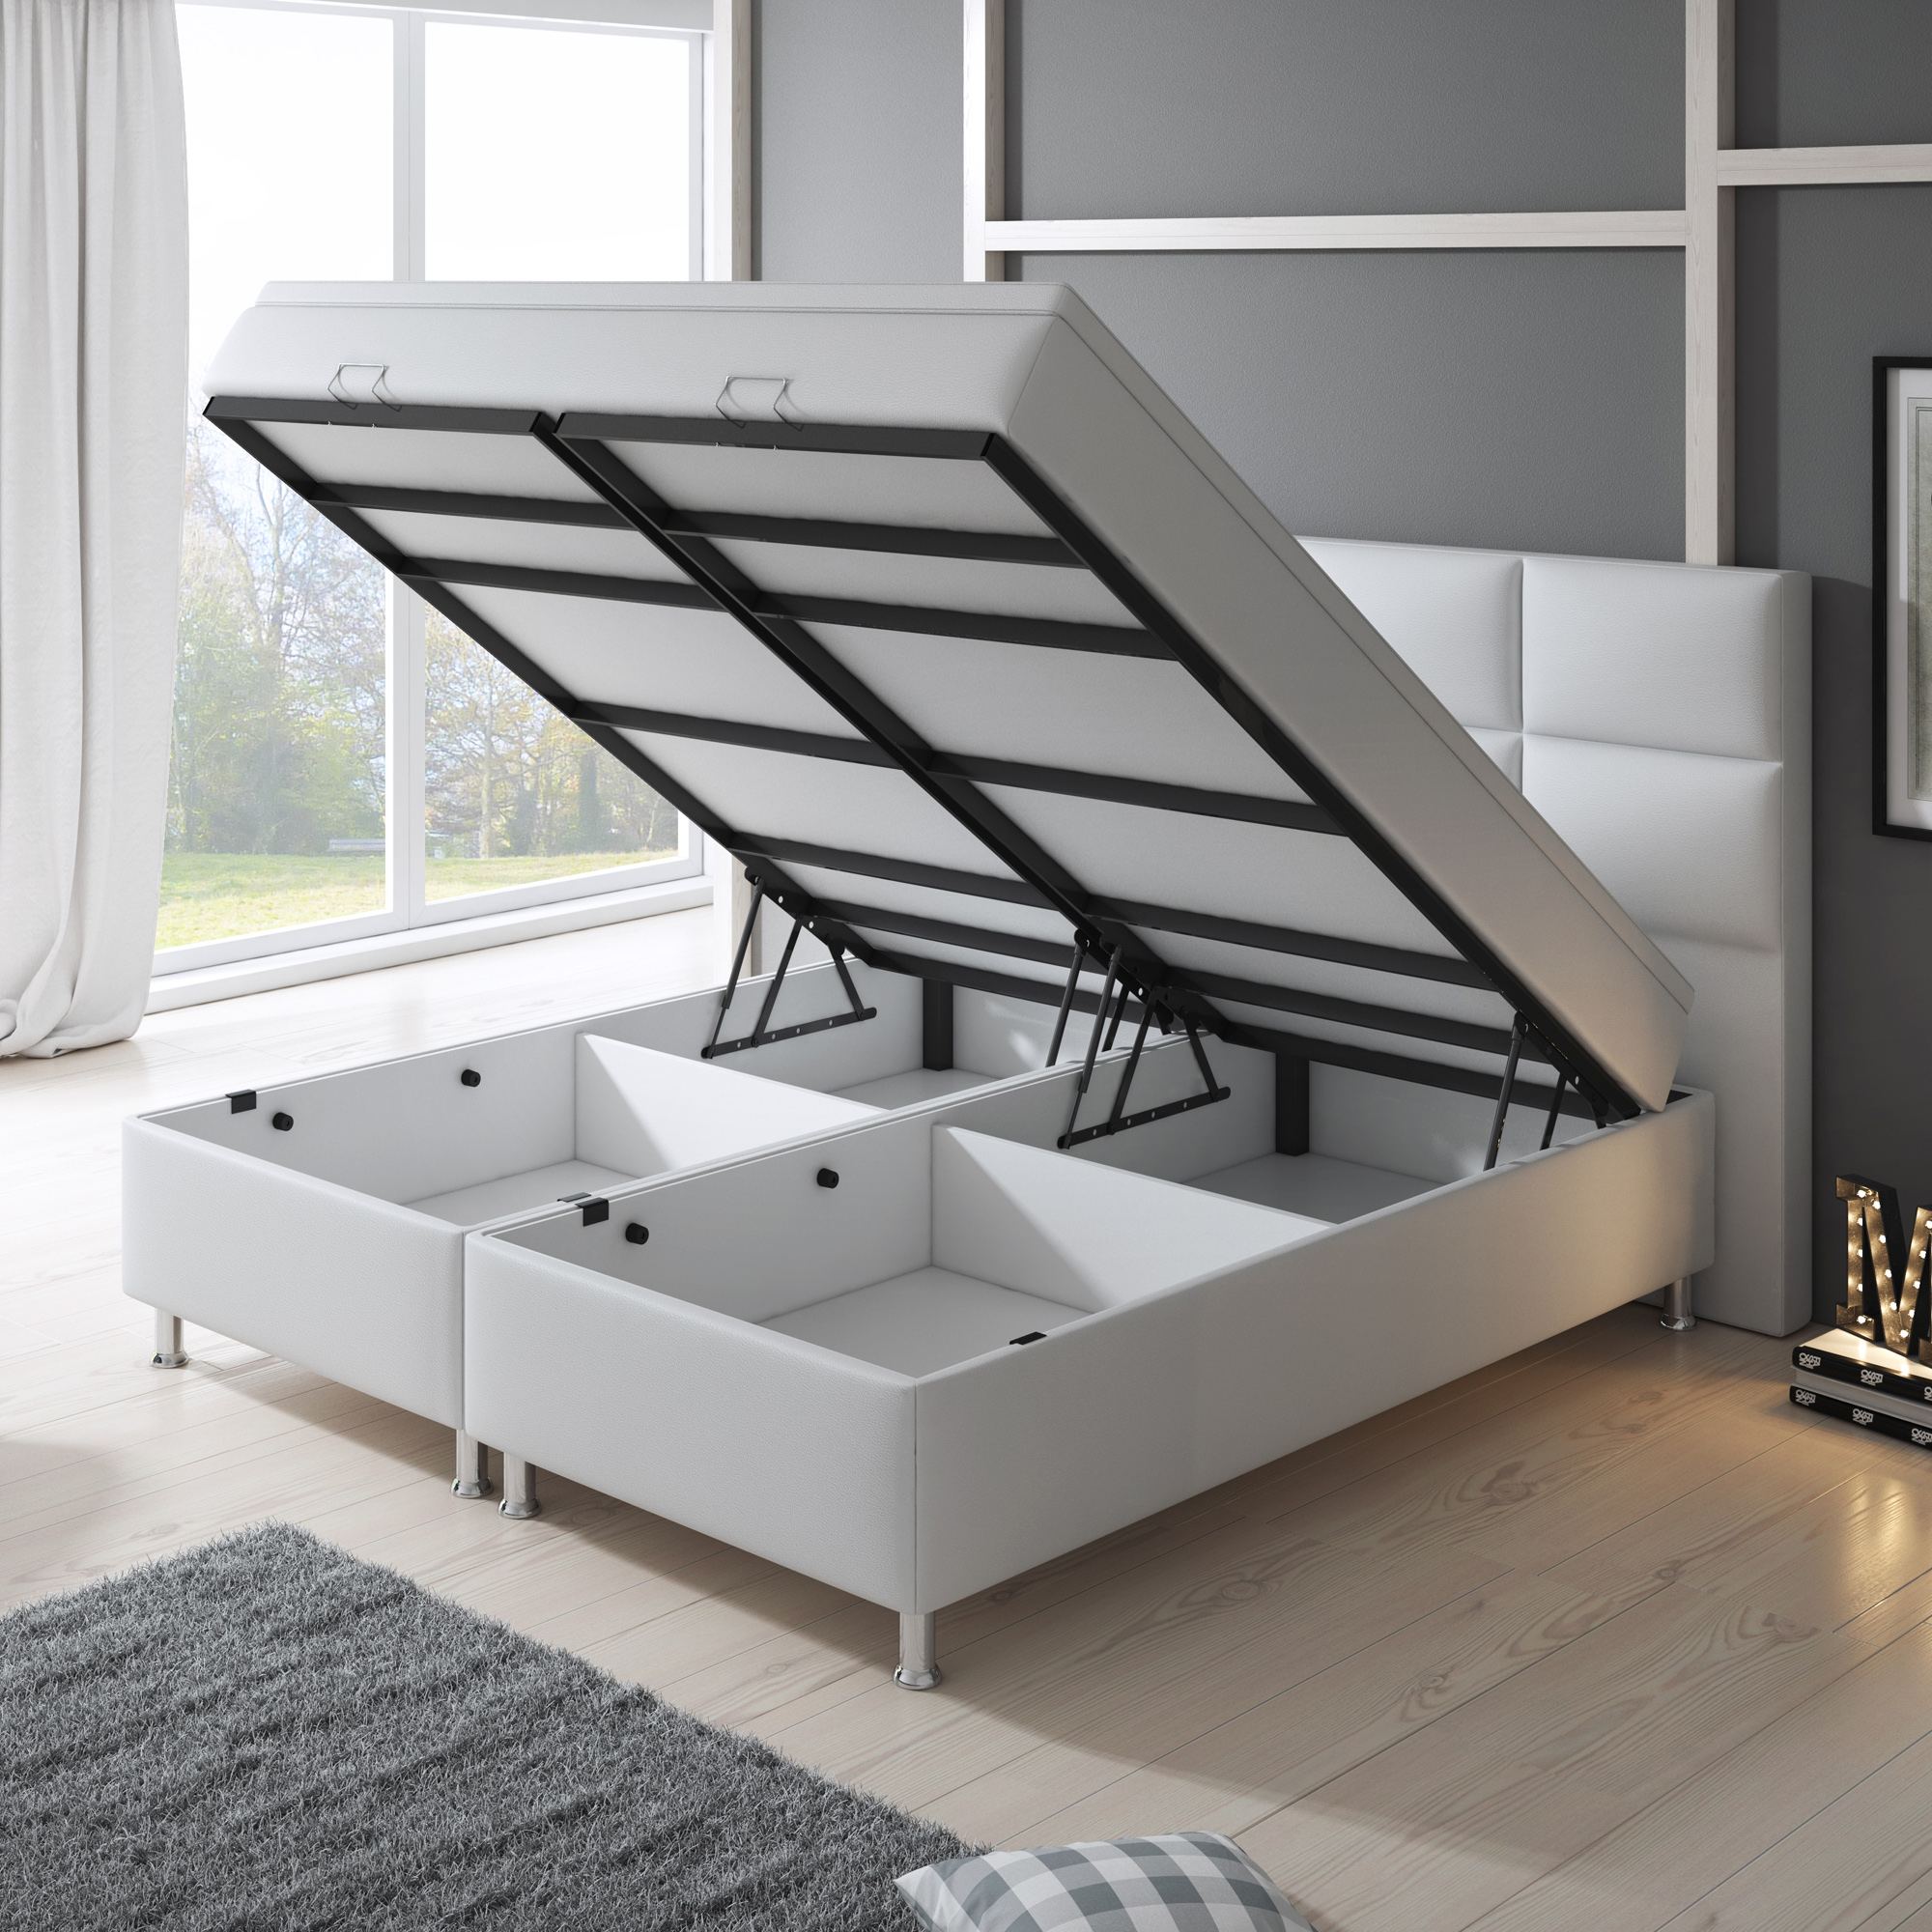 boxspringbett miami mit bettkasten 180x200 cm kunstleder. Black Bedroom Furniture Sets. Home Design Ideas